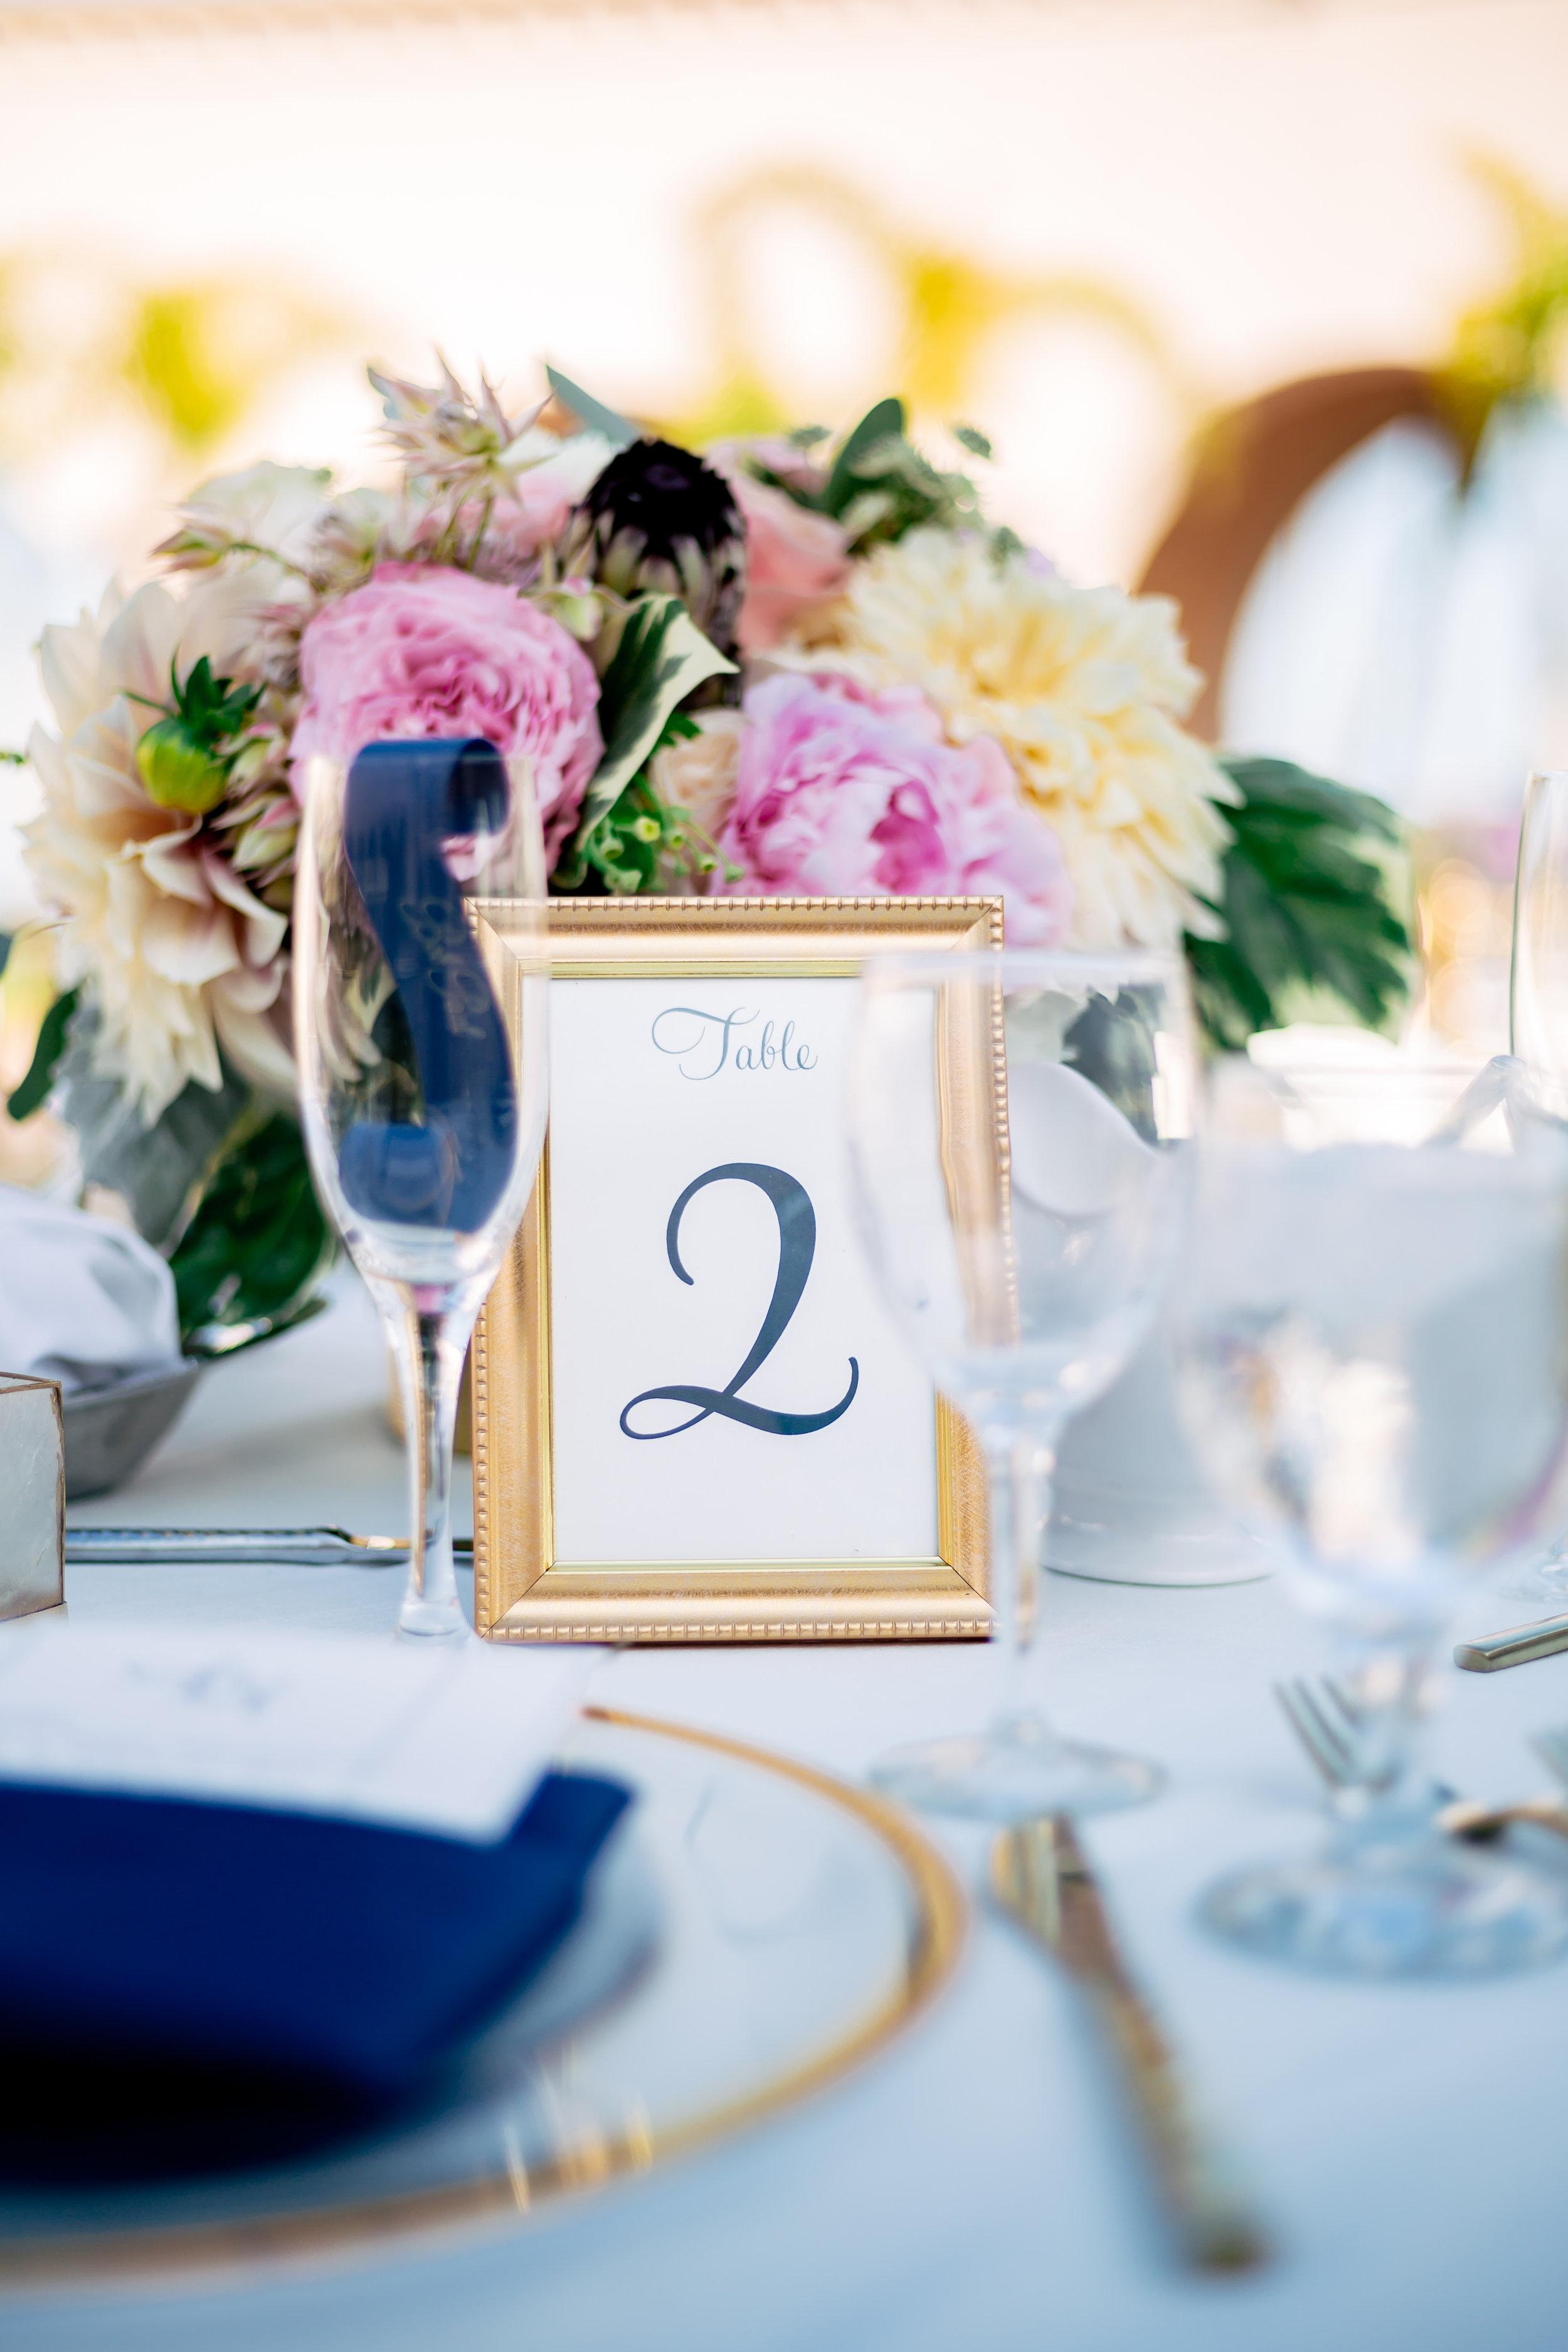 www.santabarbarawedding.com   Rewind Photography   Hilton Santa Barbara Beachfront Resort   Events by M and M   Reception table numbers